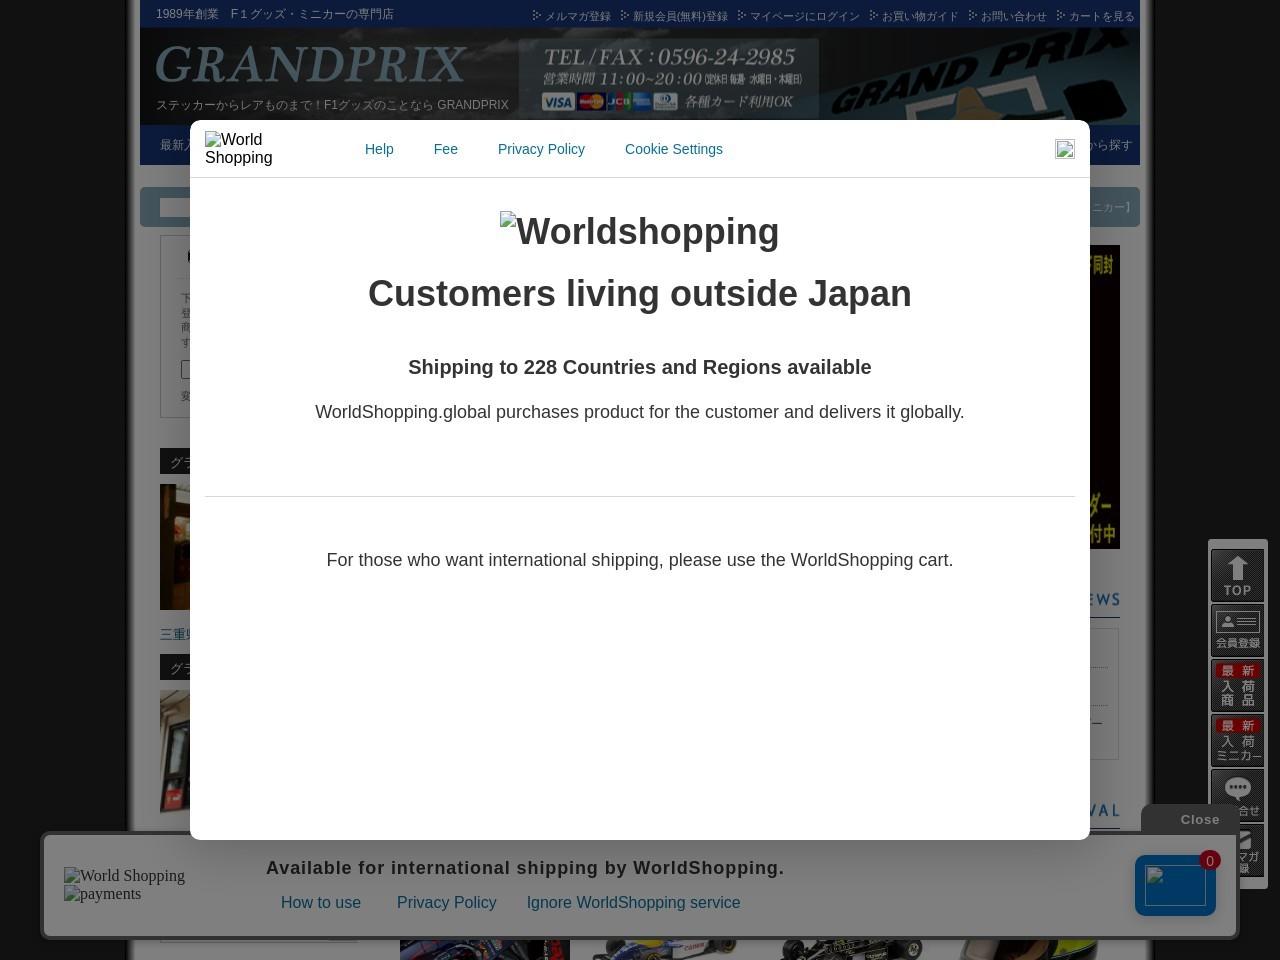 F1グッズとミニカーの専門店GRANDPRIX